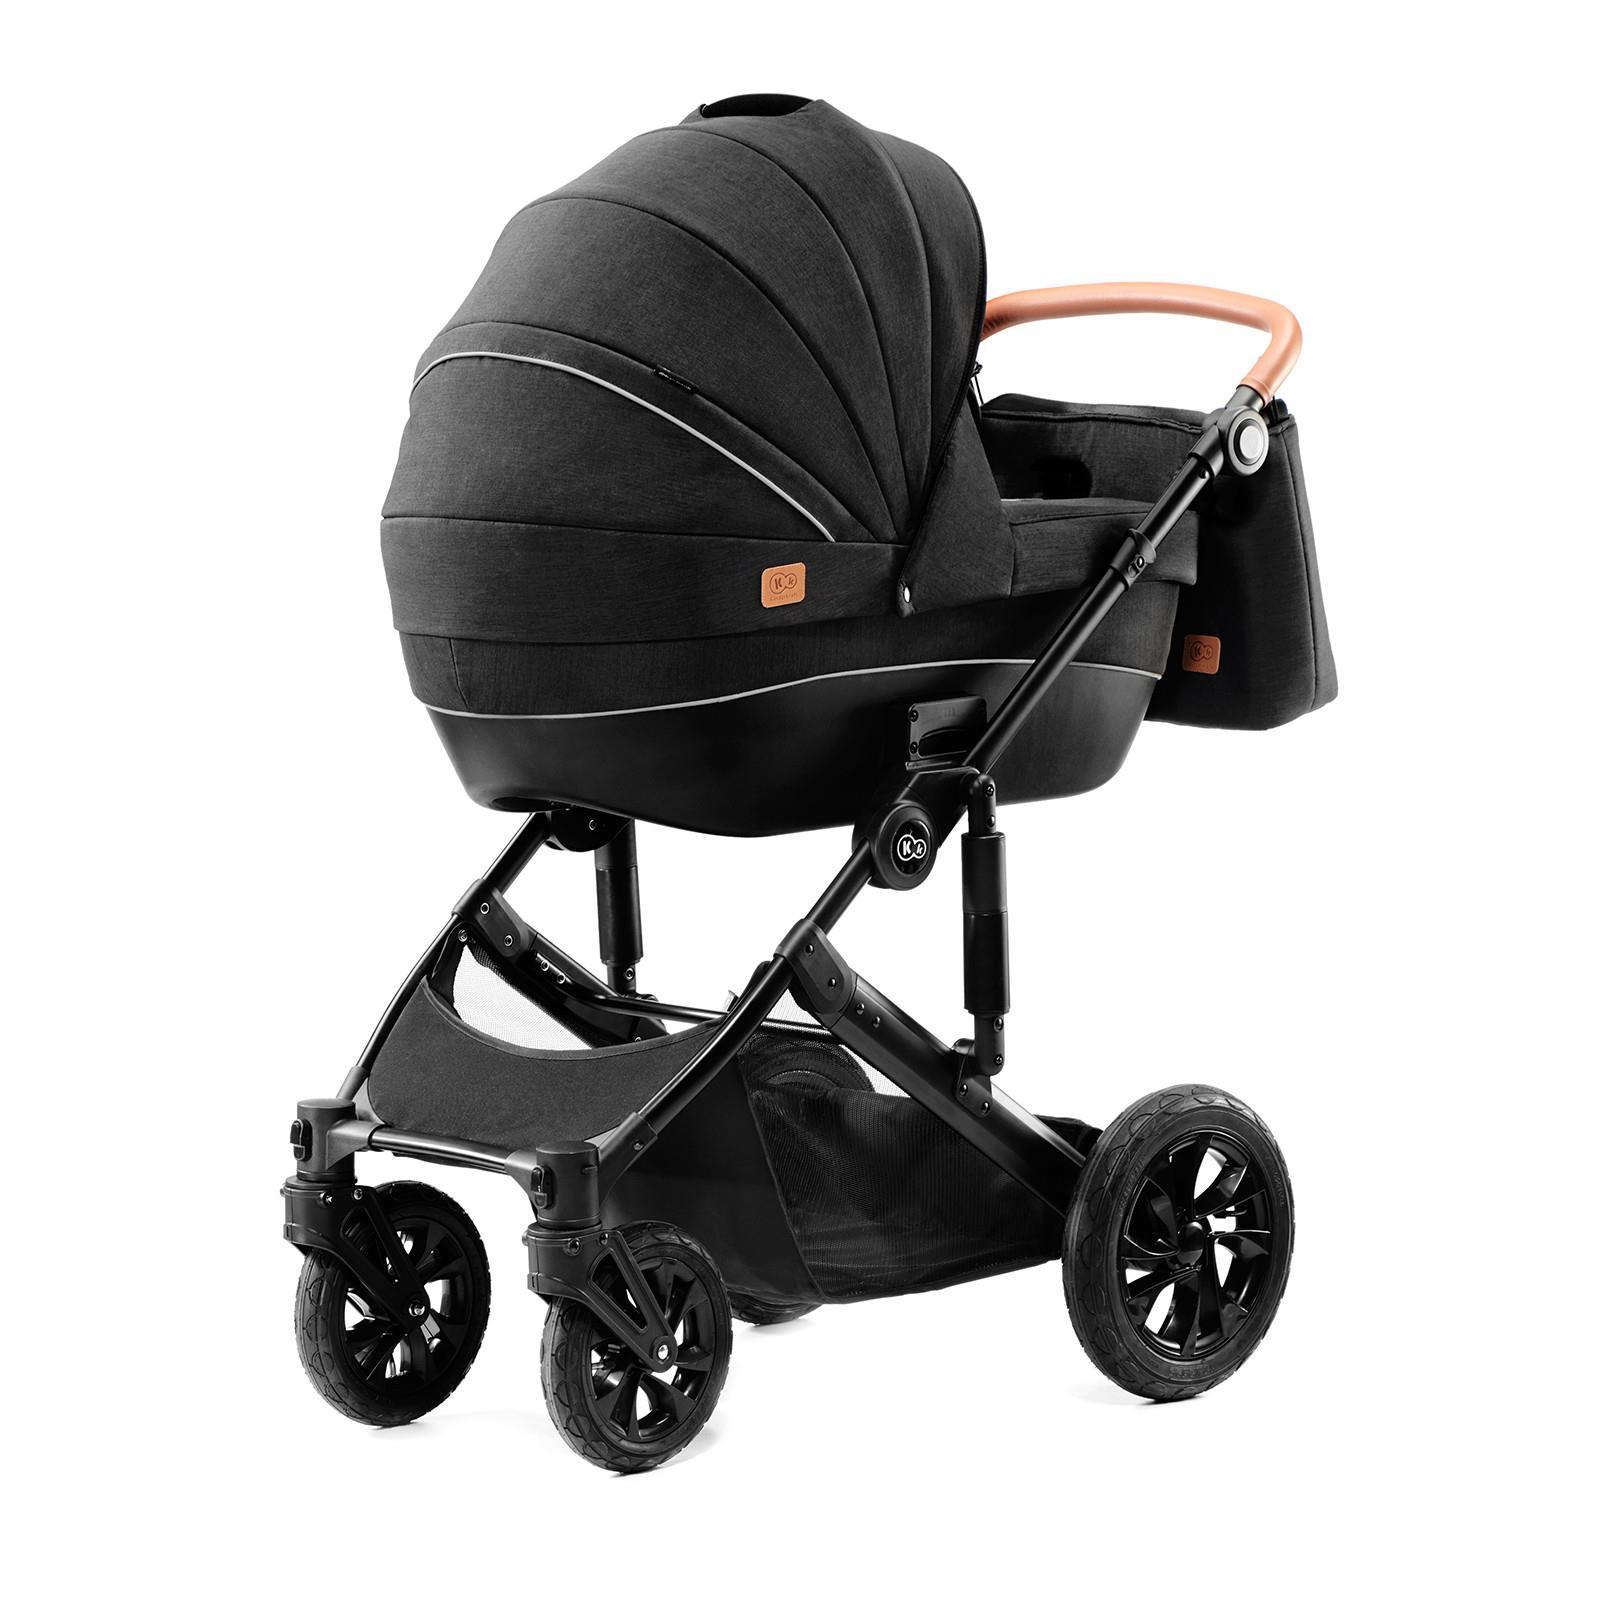 Kinderkraft PRIME z akcesoriami 3w1 black bērnu ratiņi